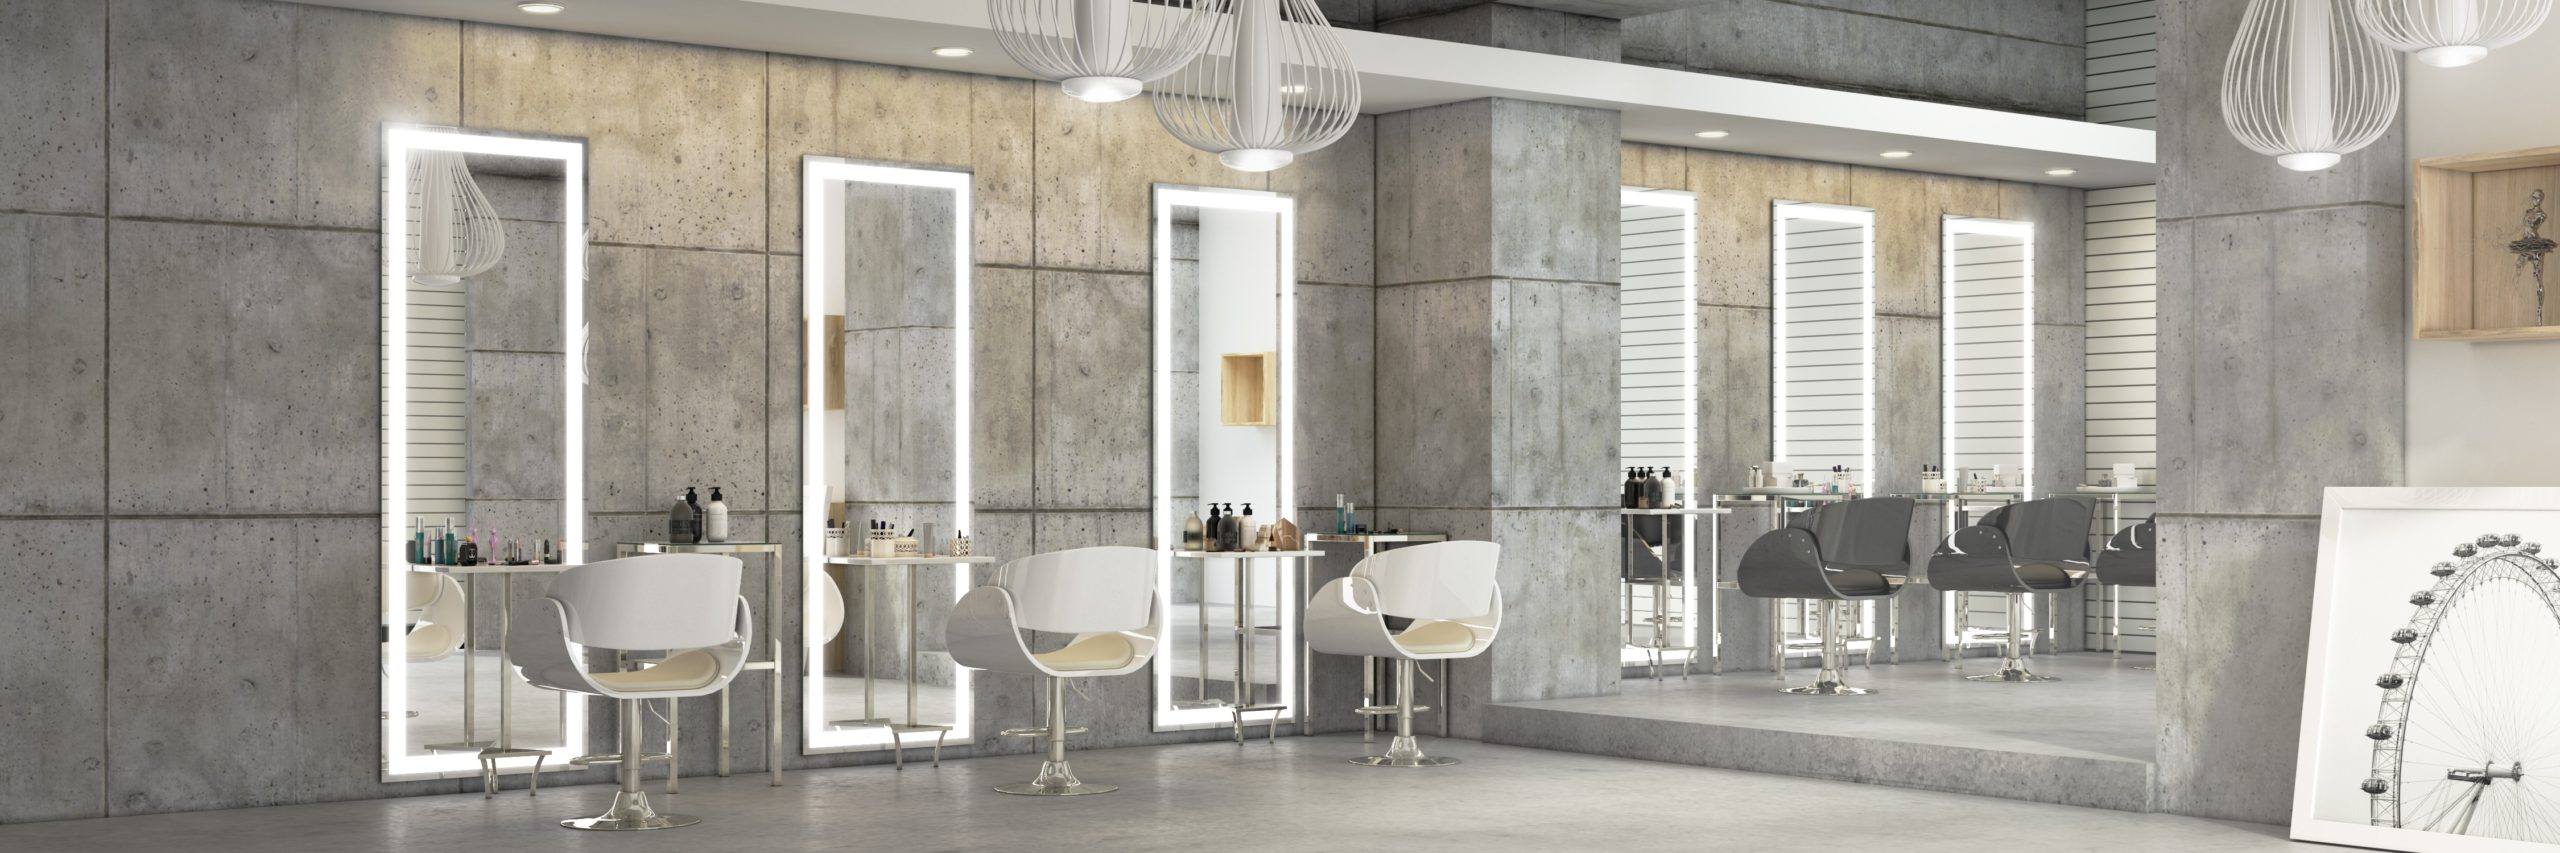 Crafted mirror columns